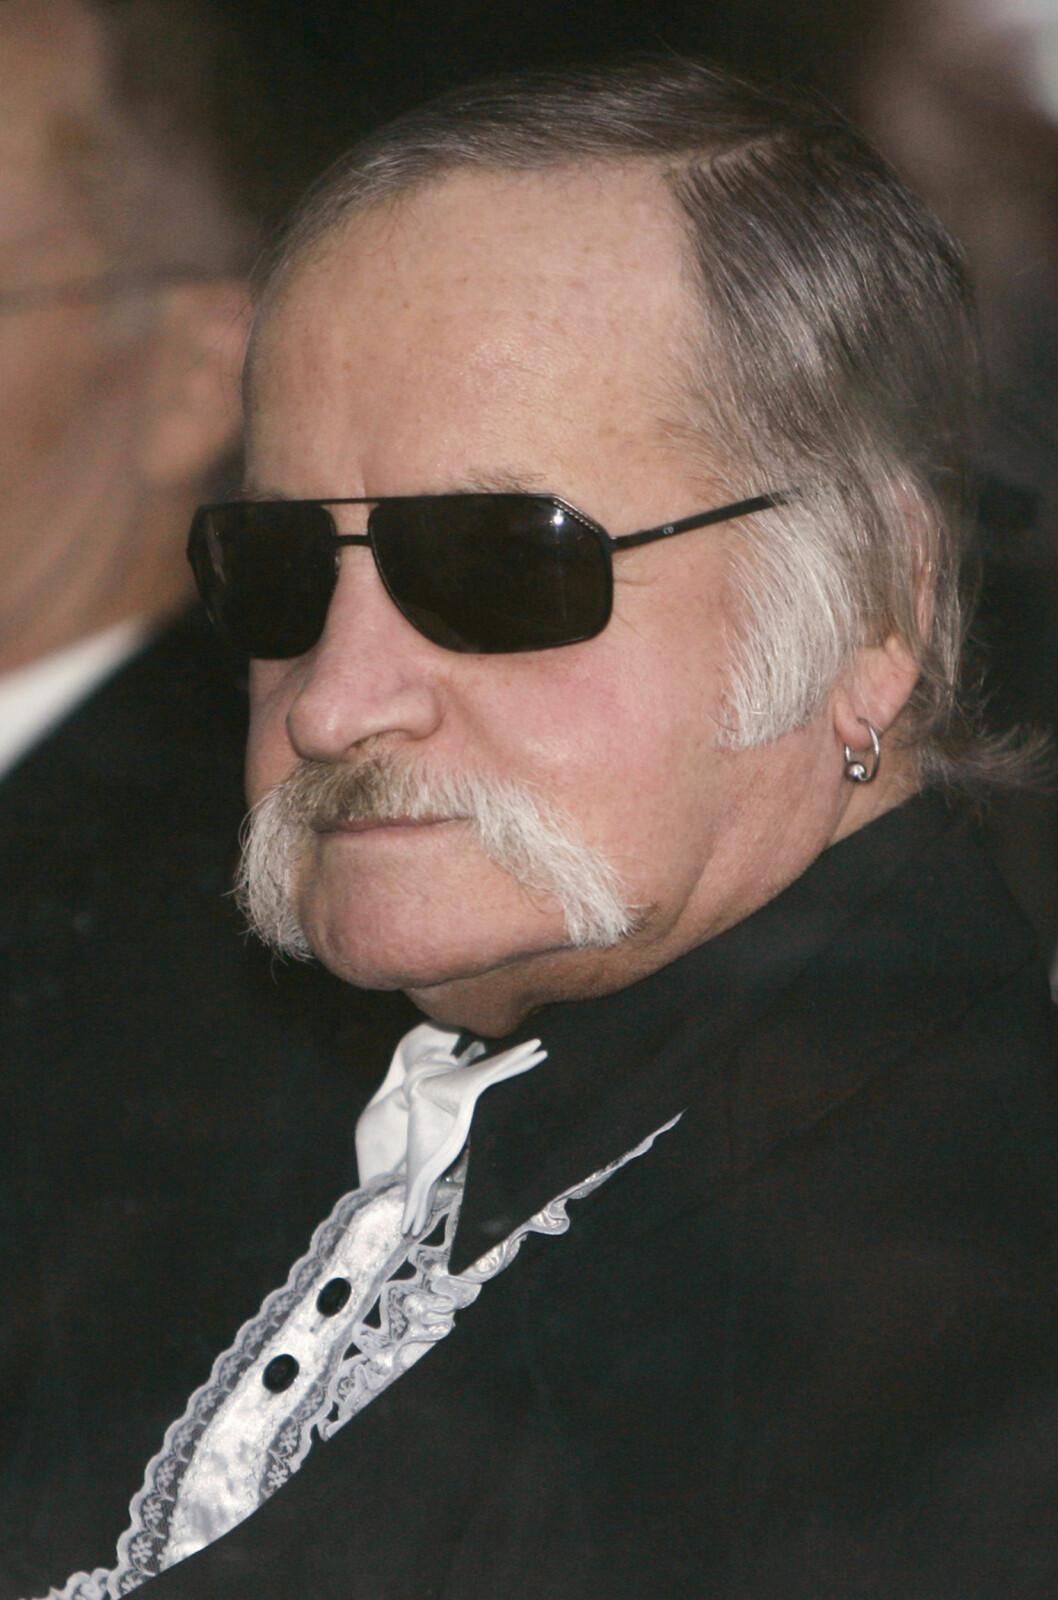 TØFF OPPVEKST: Keiths far Robert døde for et halvt år siden. Her er han i bryllupet til sønnen og svigerdatteren i 2006. Foto: NTB Scanpix